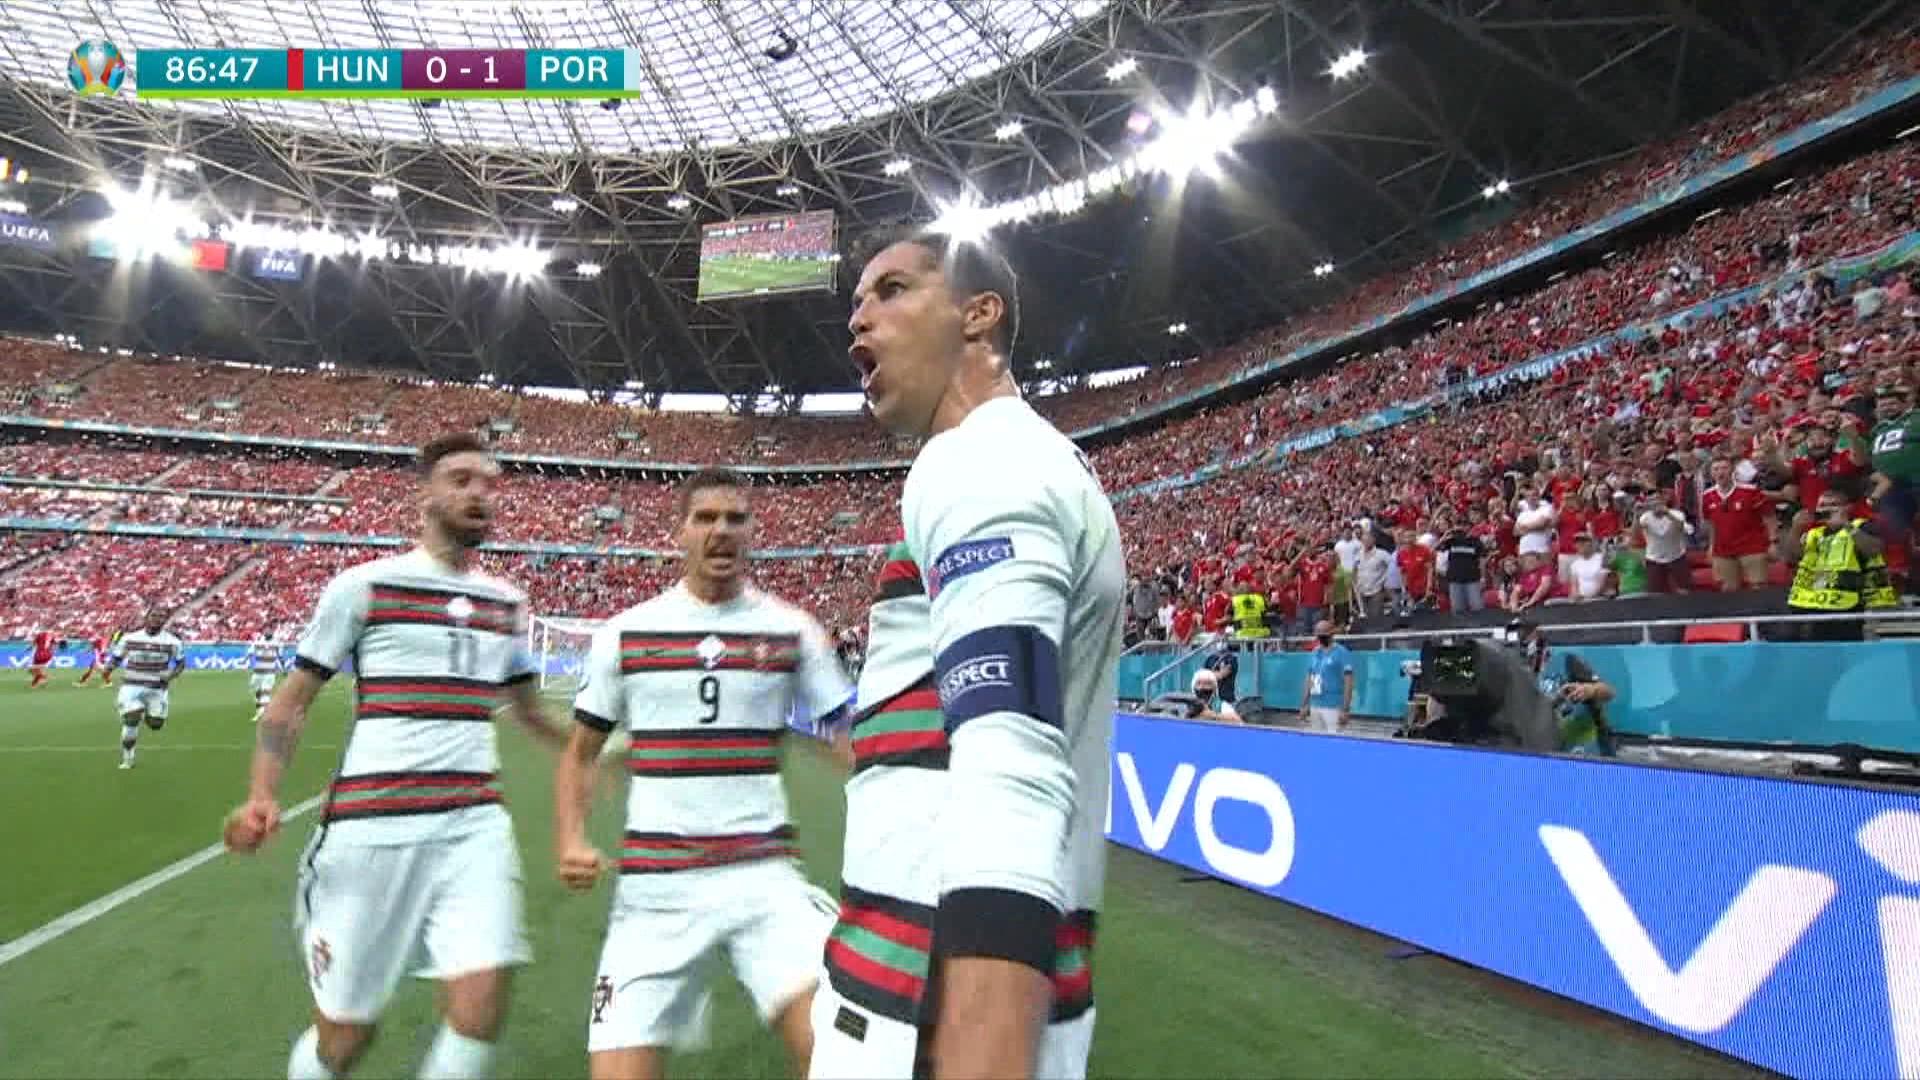 Fran%C3%A7a%2C+guanya%3B+Portugal%2C+goleja